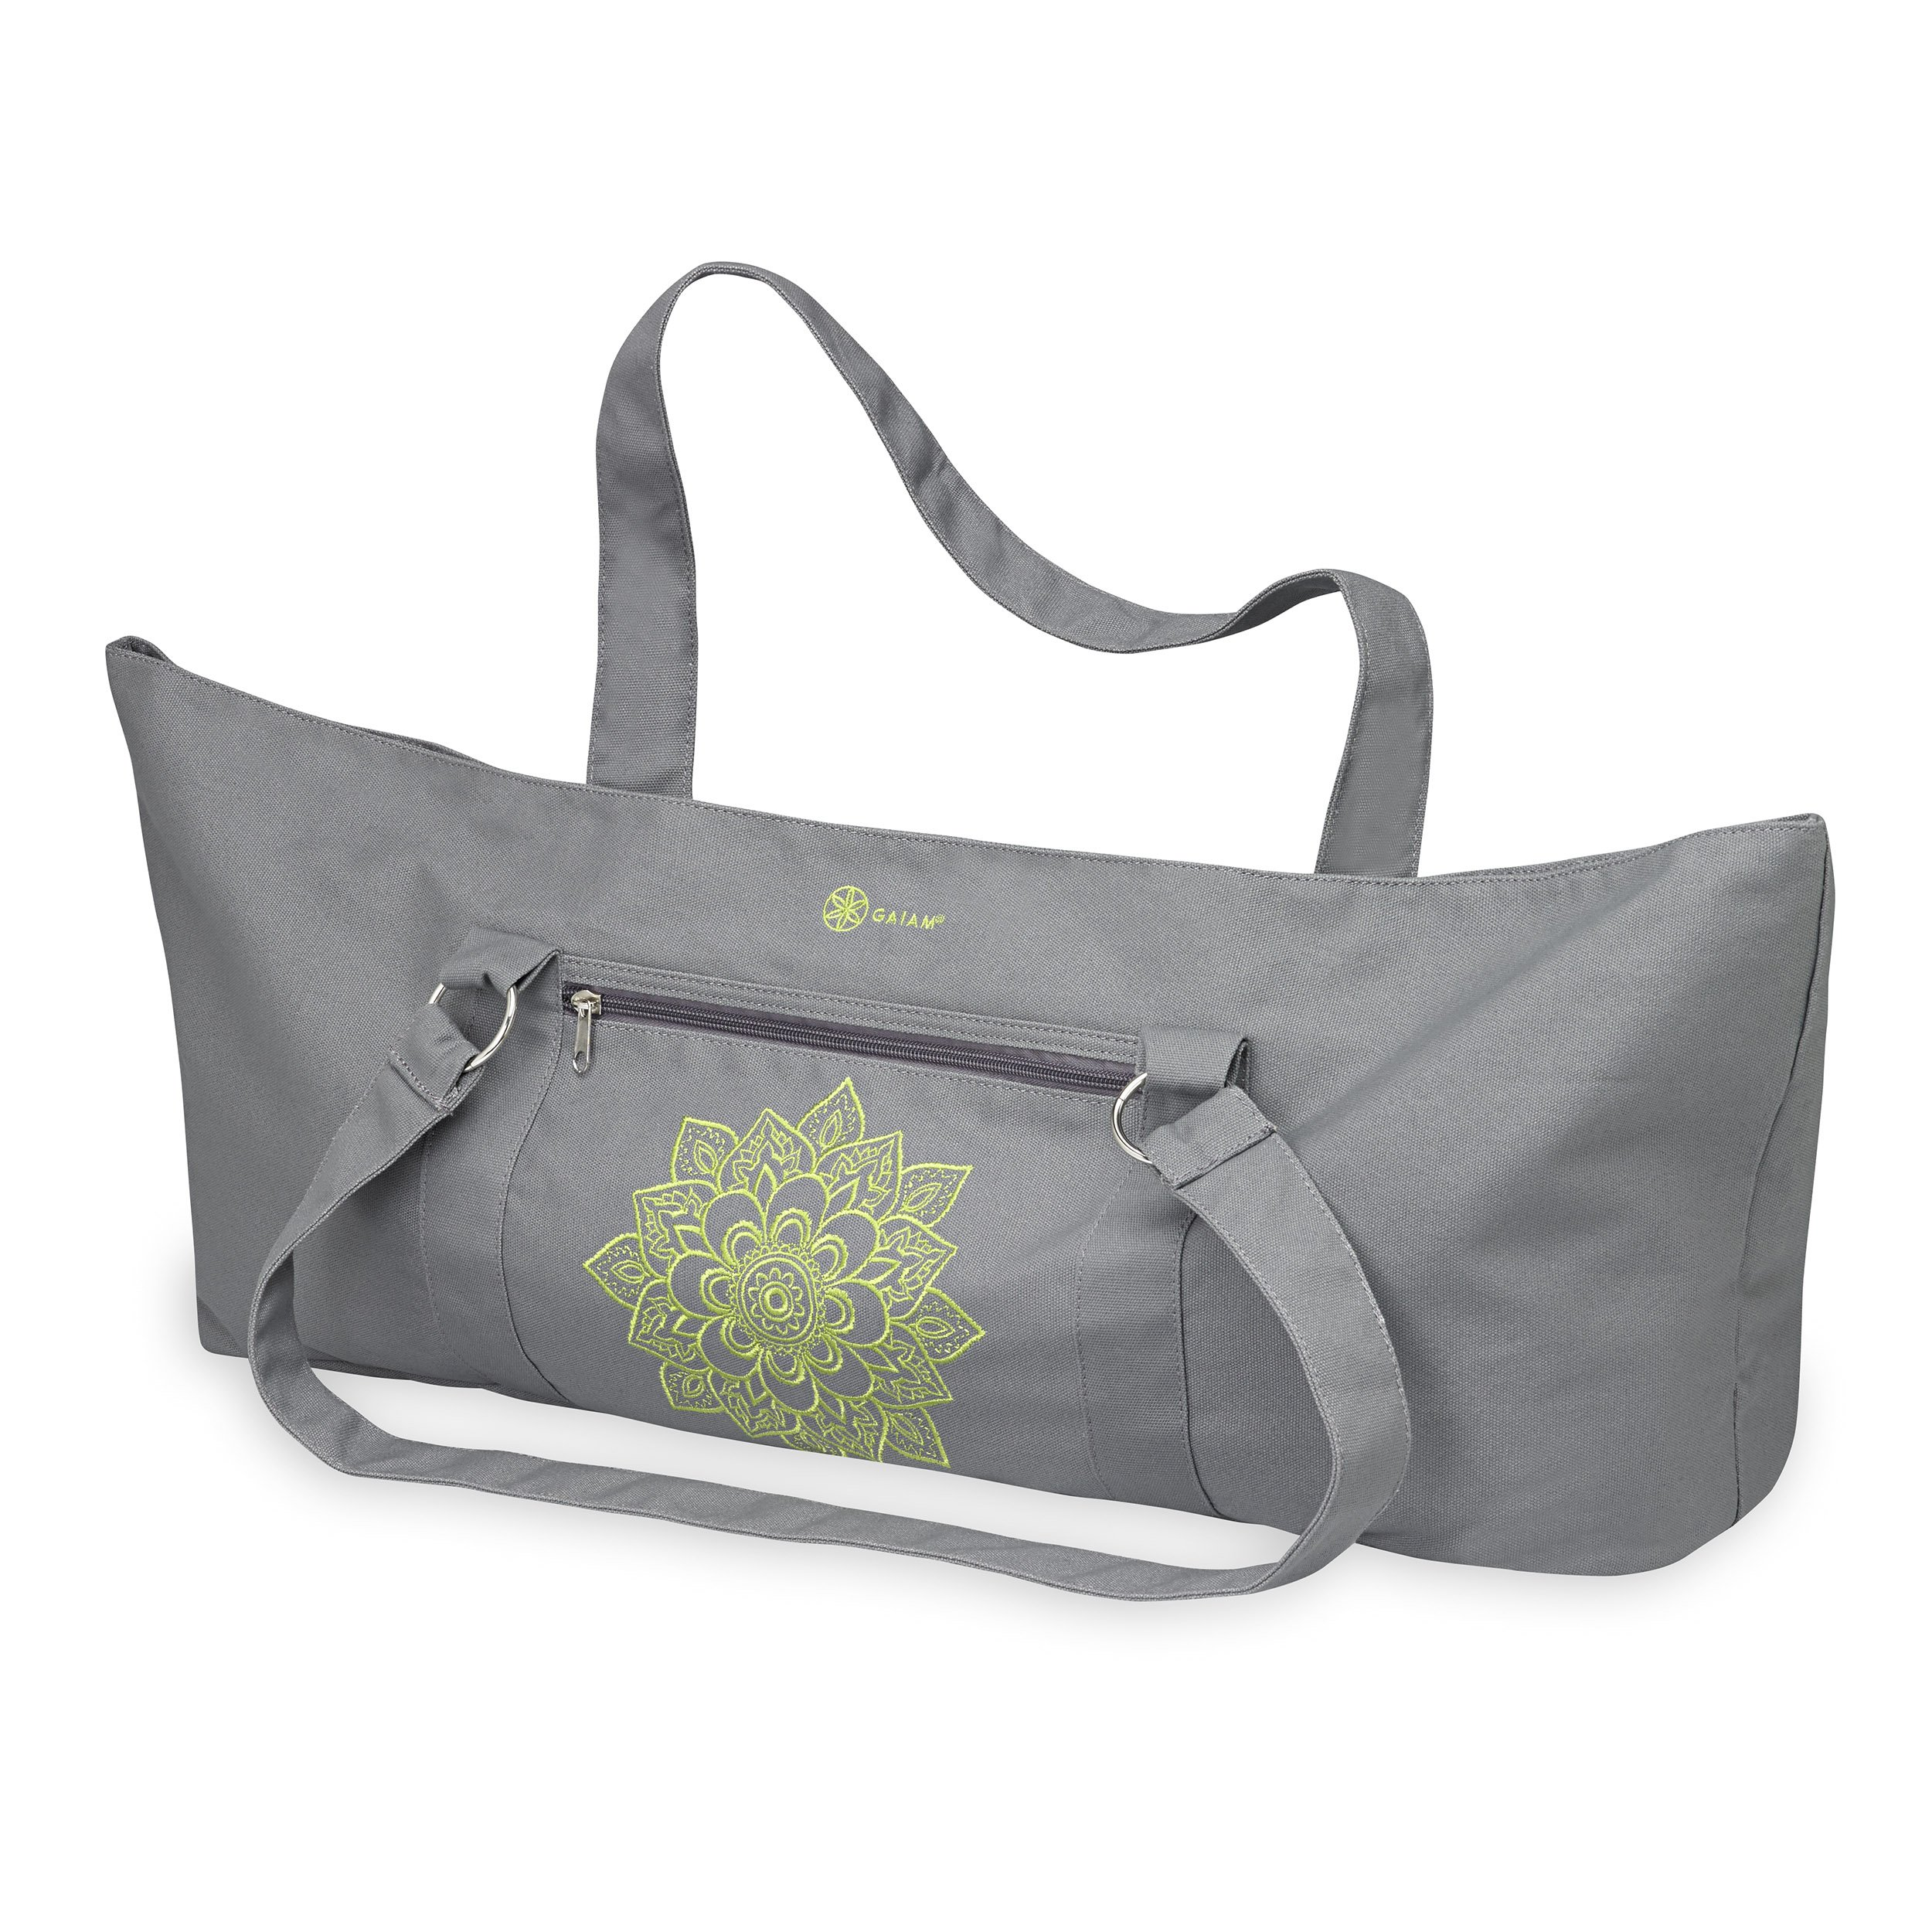 Gaiam Yoga Mat Tote Bag, Citron Sundial